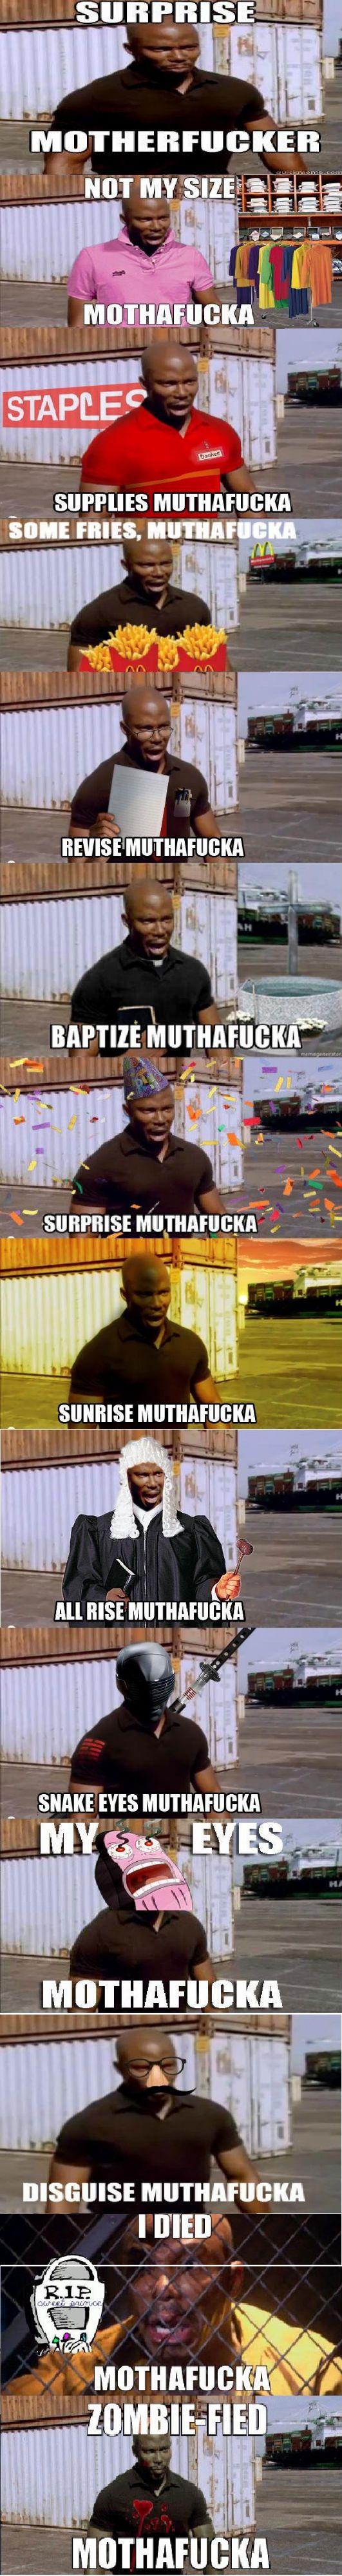 best of surprise muthafucka meme